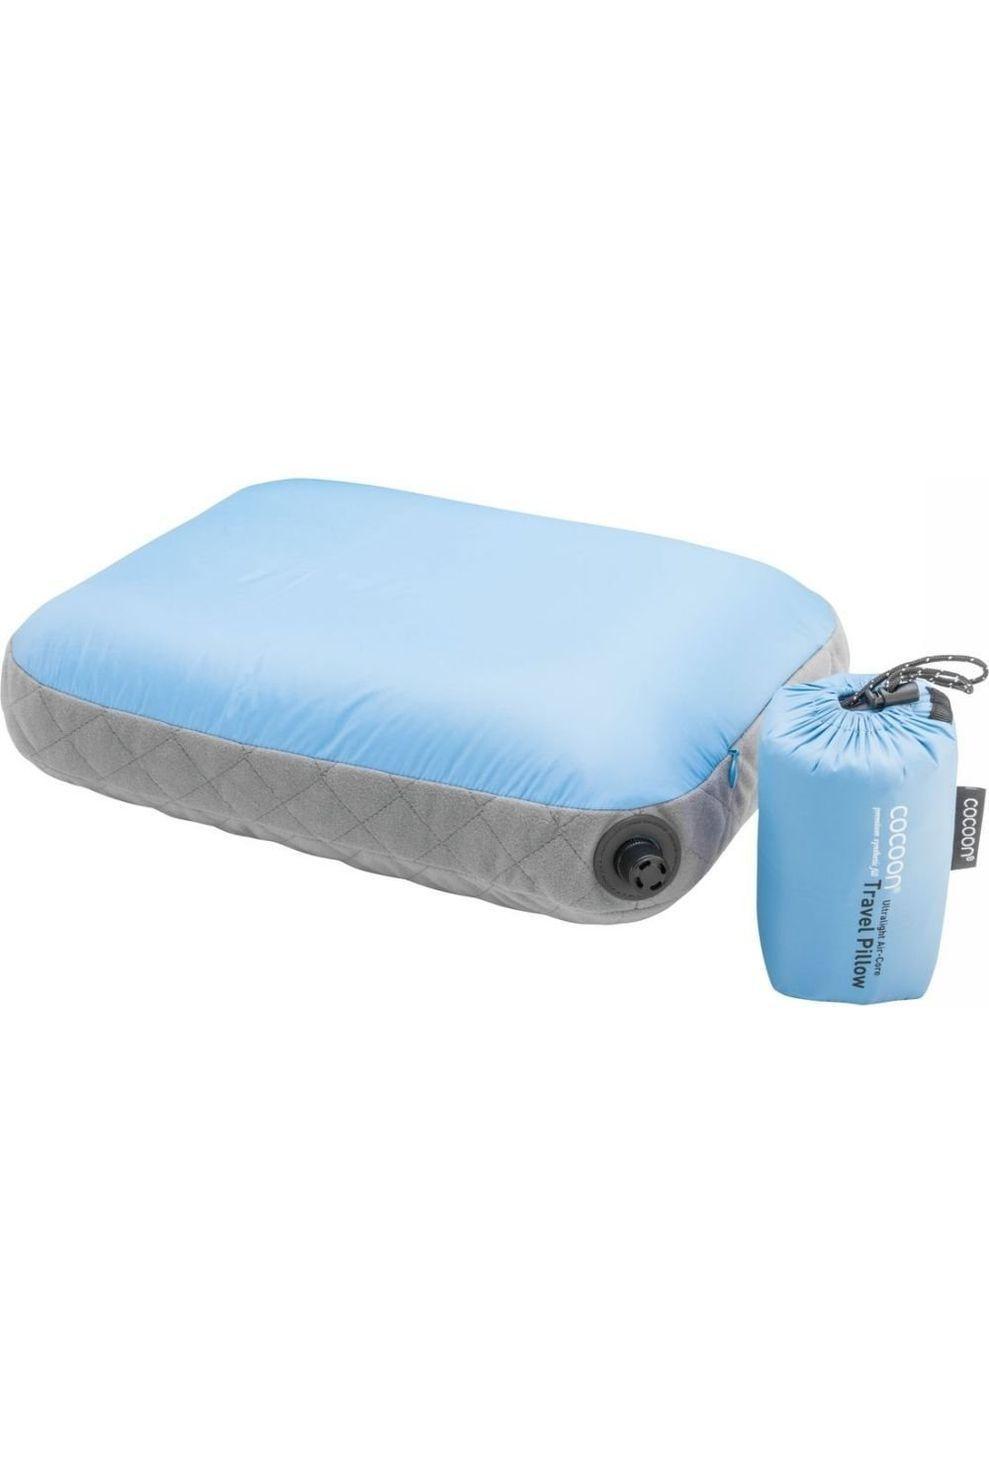 Cocoon Kussen Air Core Ultralight M - Blauw/Grijs